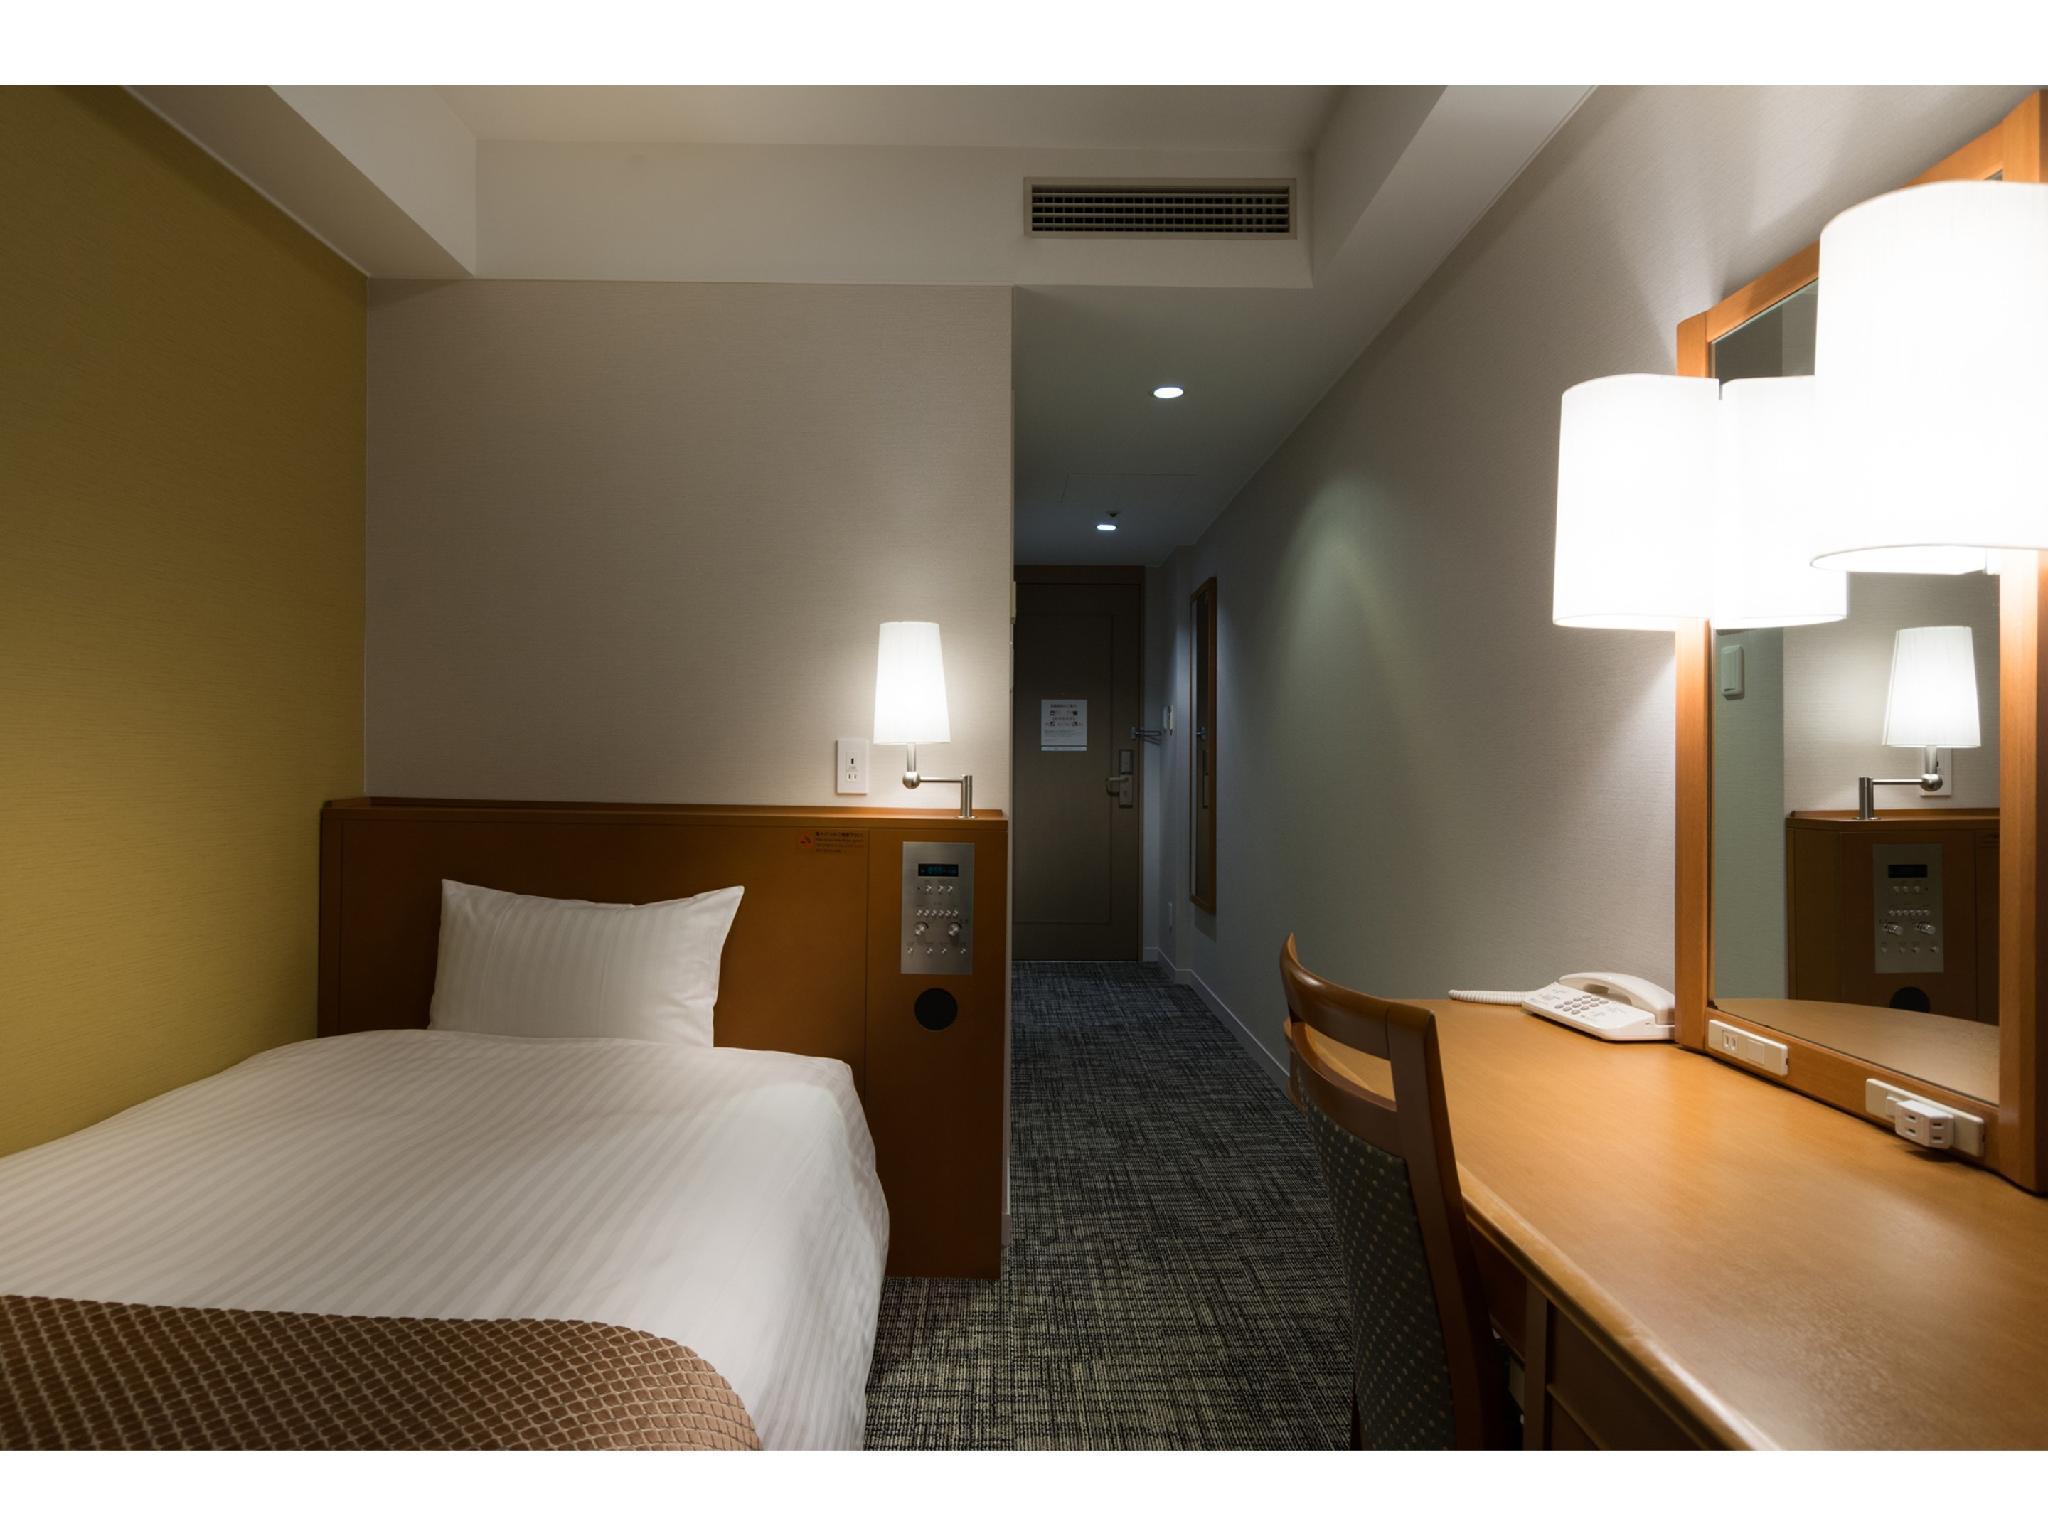 Toshi Center Hotel (Rihga Royal Hotel Group), Chiyoda